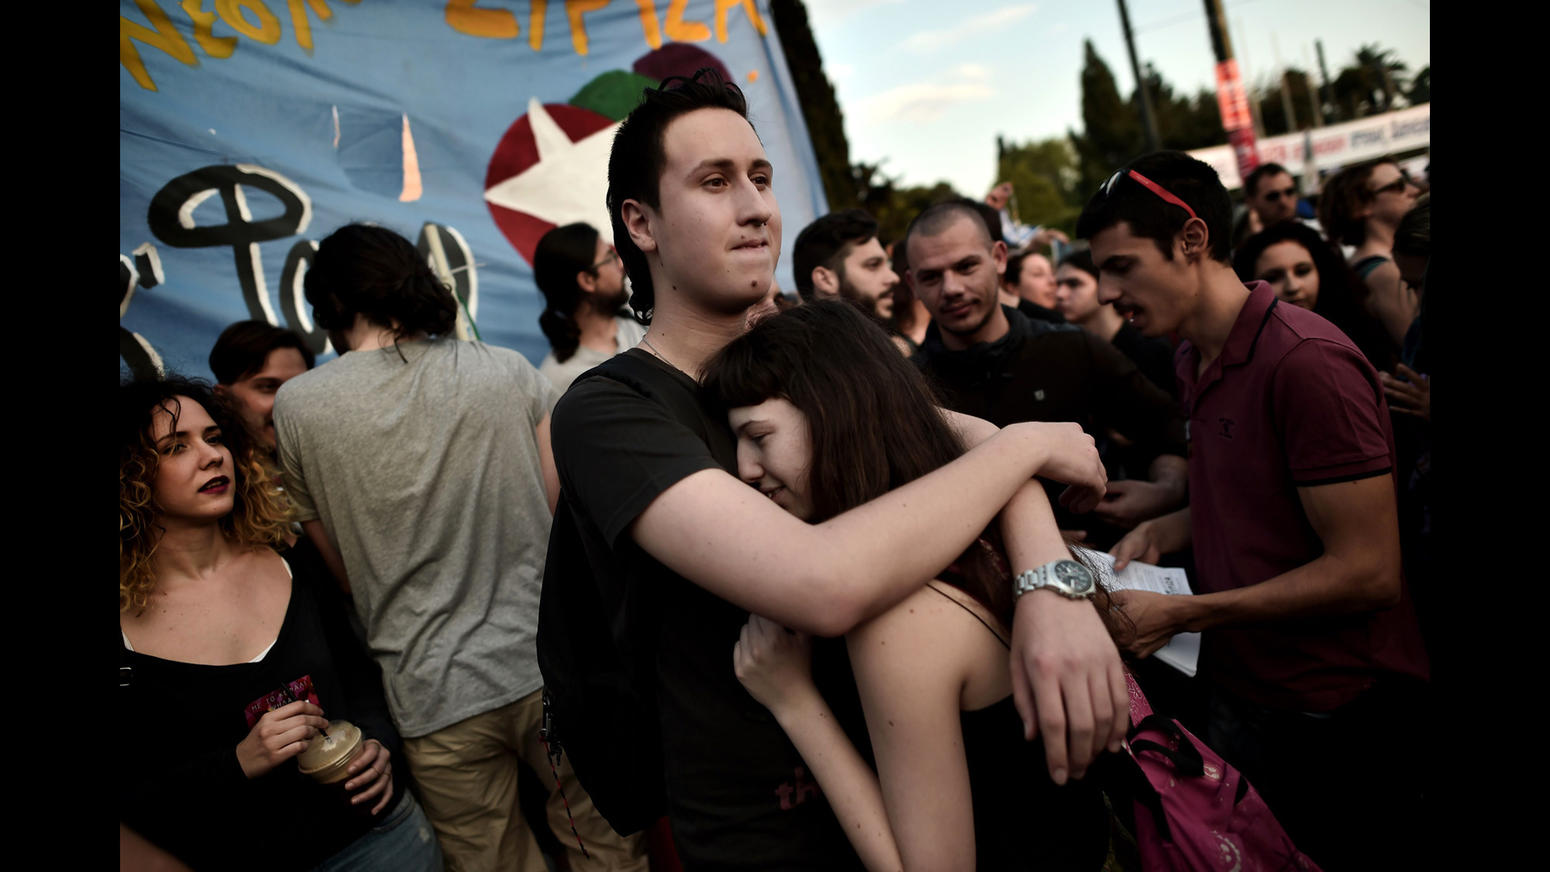 Debt crisis in Greece